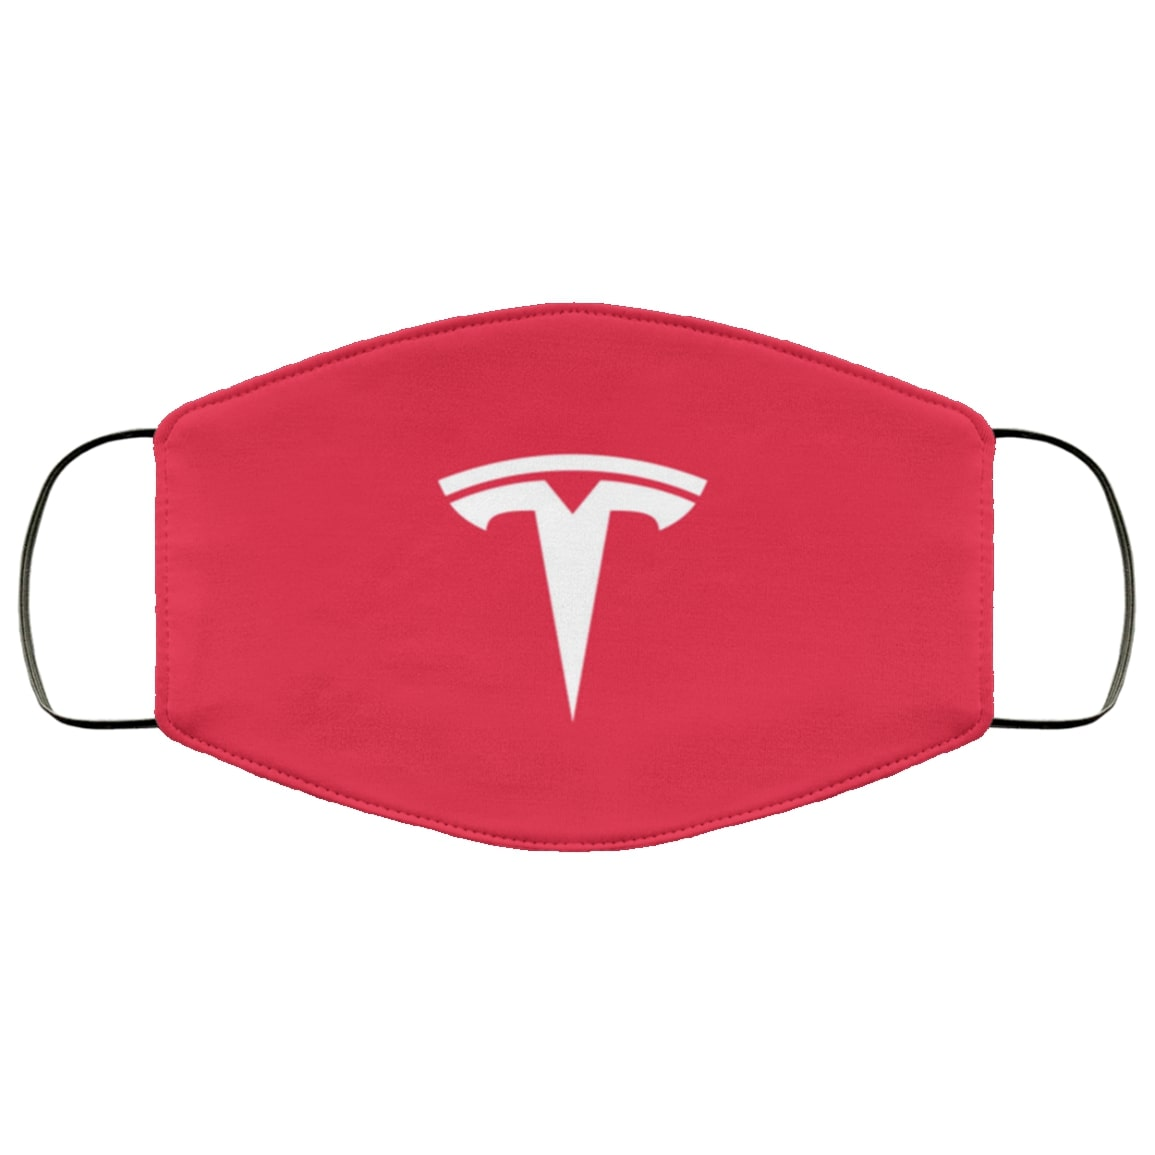 Tesla motors full over printed face mask 3